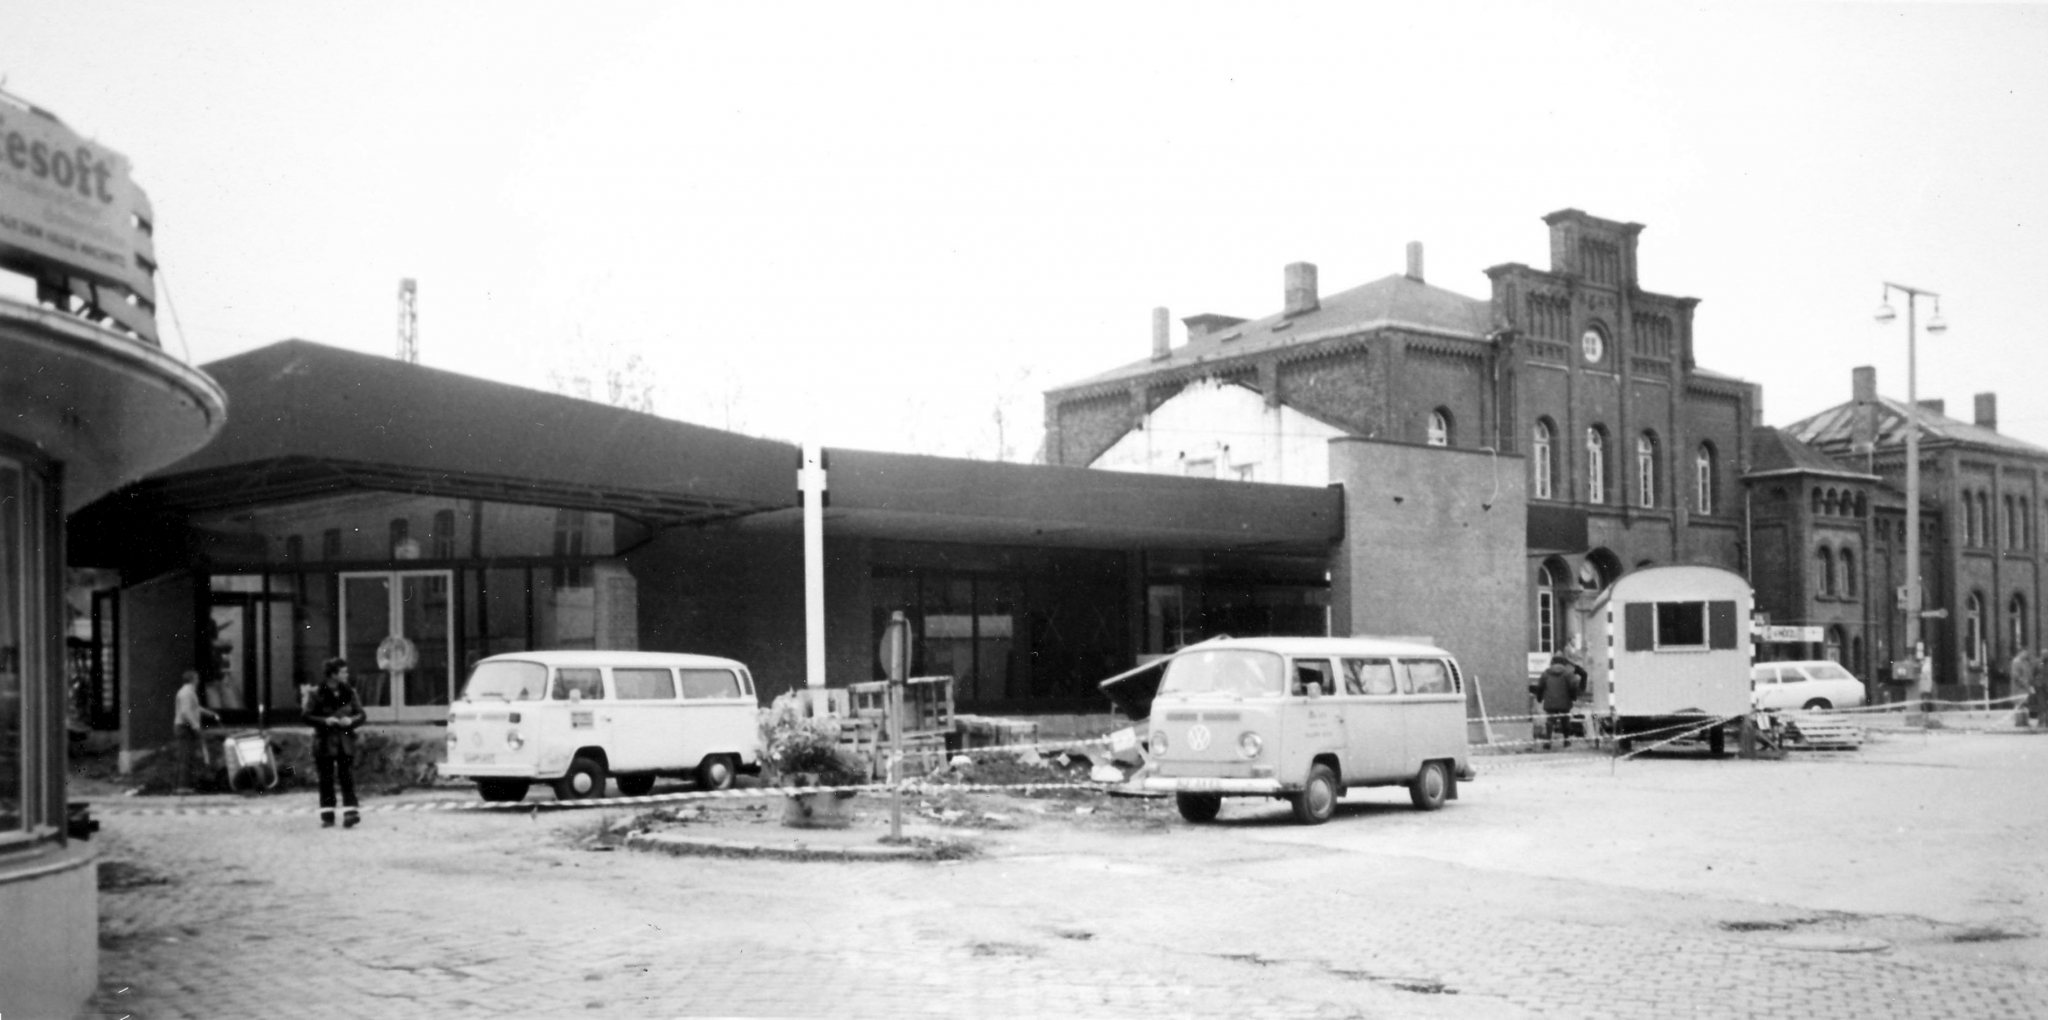 Bahnhof1978-11